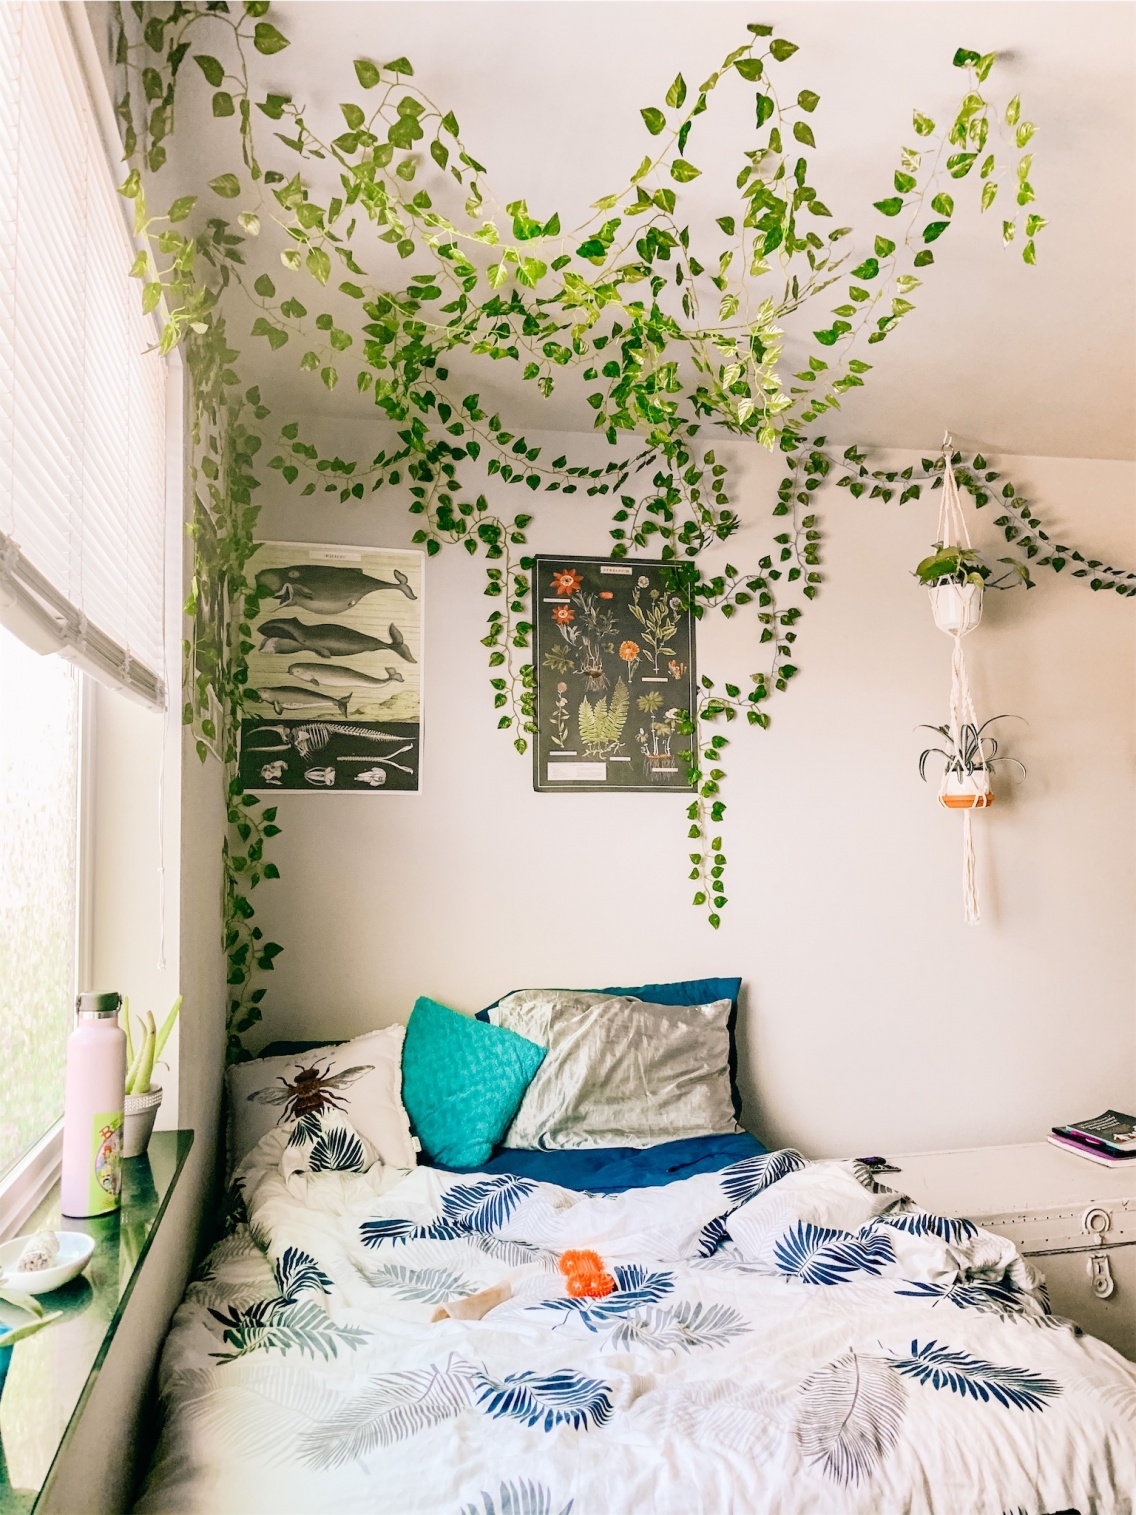 Bedroom Aesthetic Indoorplants Plants Pinterest Love Abundance Peace Decoration Homedecor Lavendersmycolor Vsco